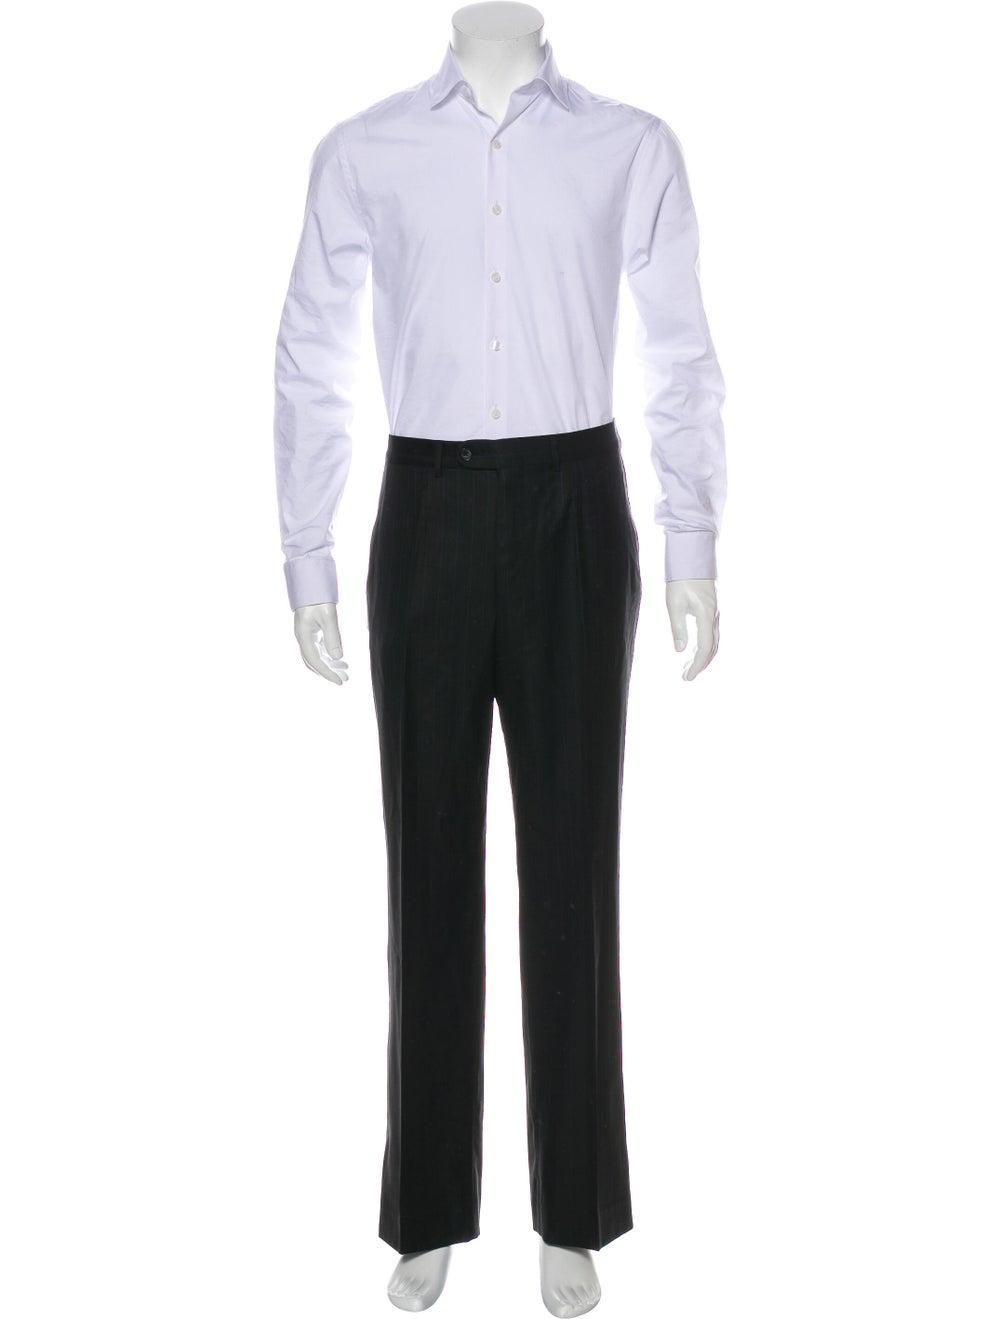 Ermenegildo Zegna Silk Striped Two-Piece Suit Bla… - image 4